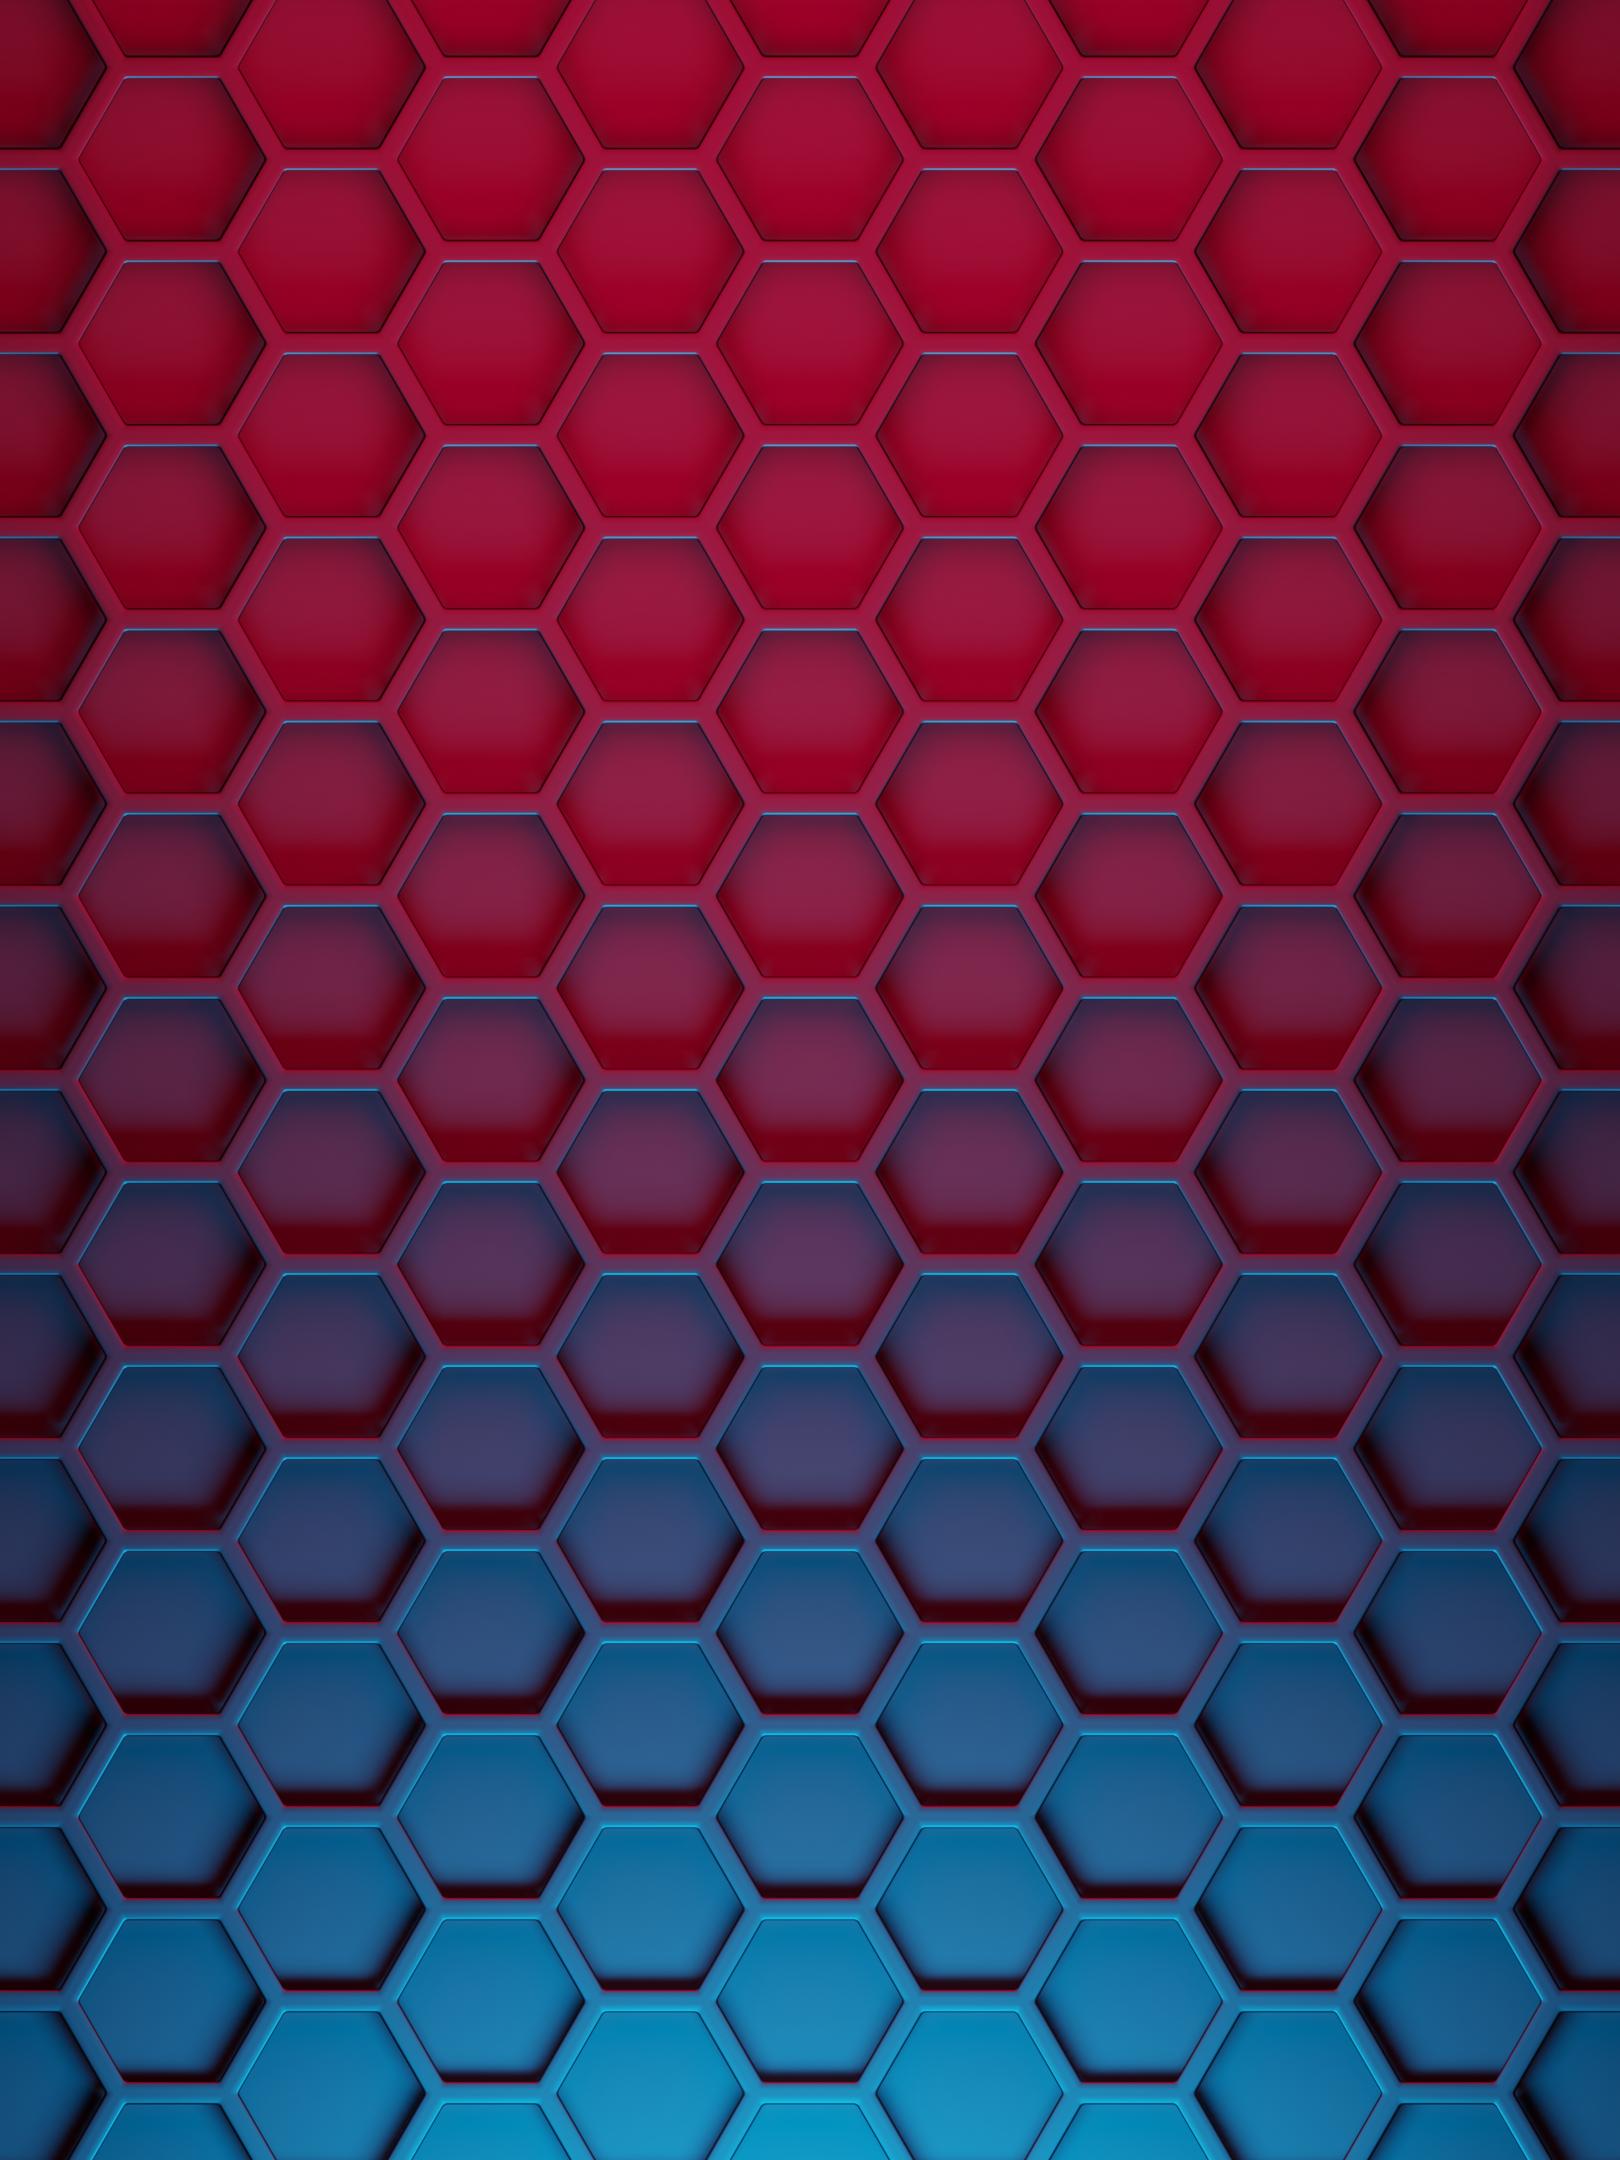 Wallpaper 887527